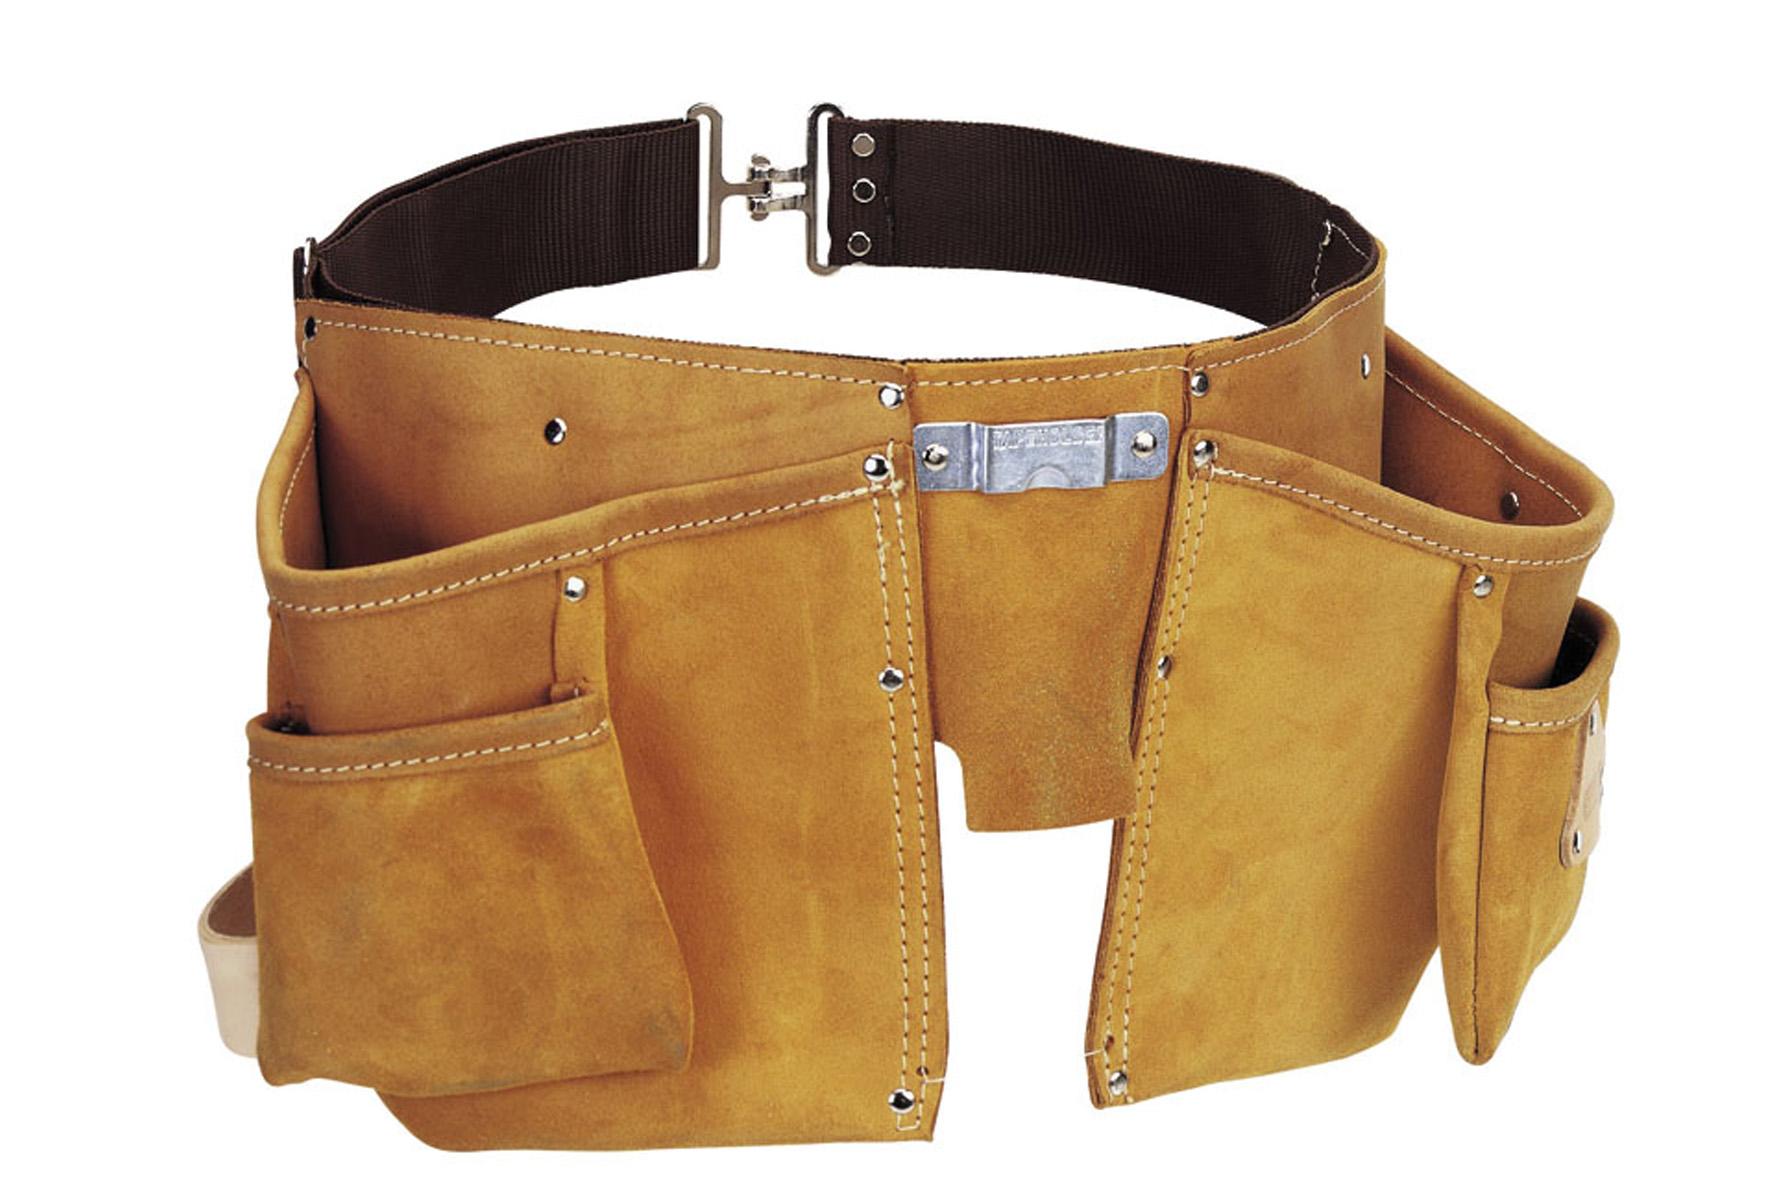 ceinture 2 porte outil 6 poches stanley achat en ligne ou dans notre magasin. Black Bedroom Furniture Sets. Home Design Ideas